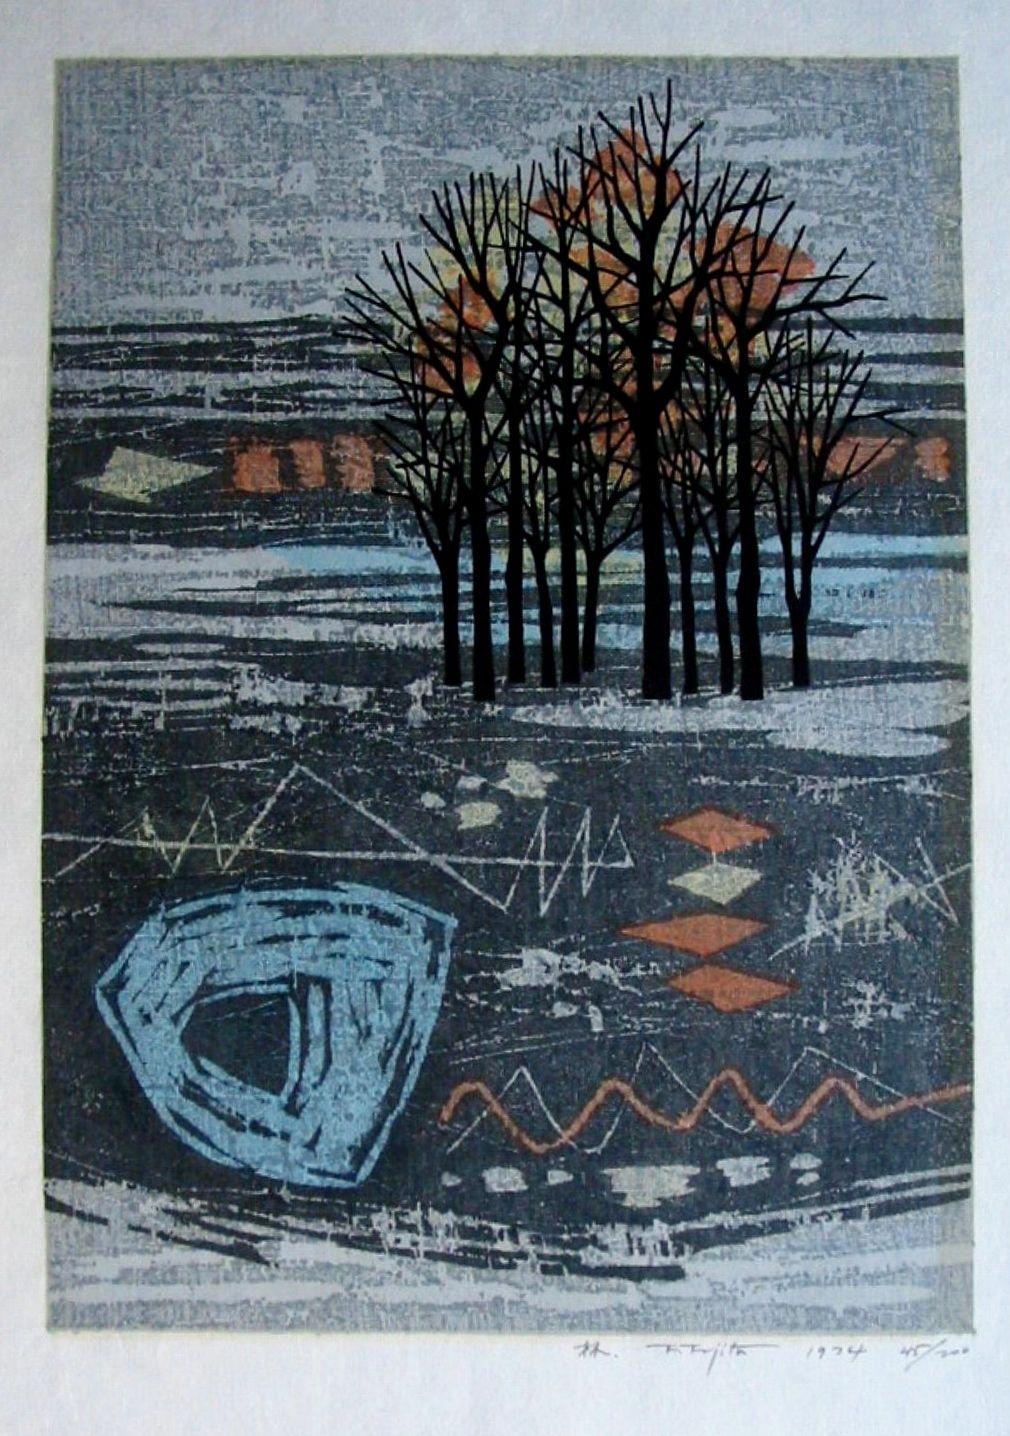 Grove of Trees (1974) Fumio Fujita